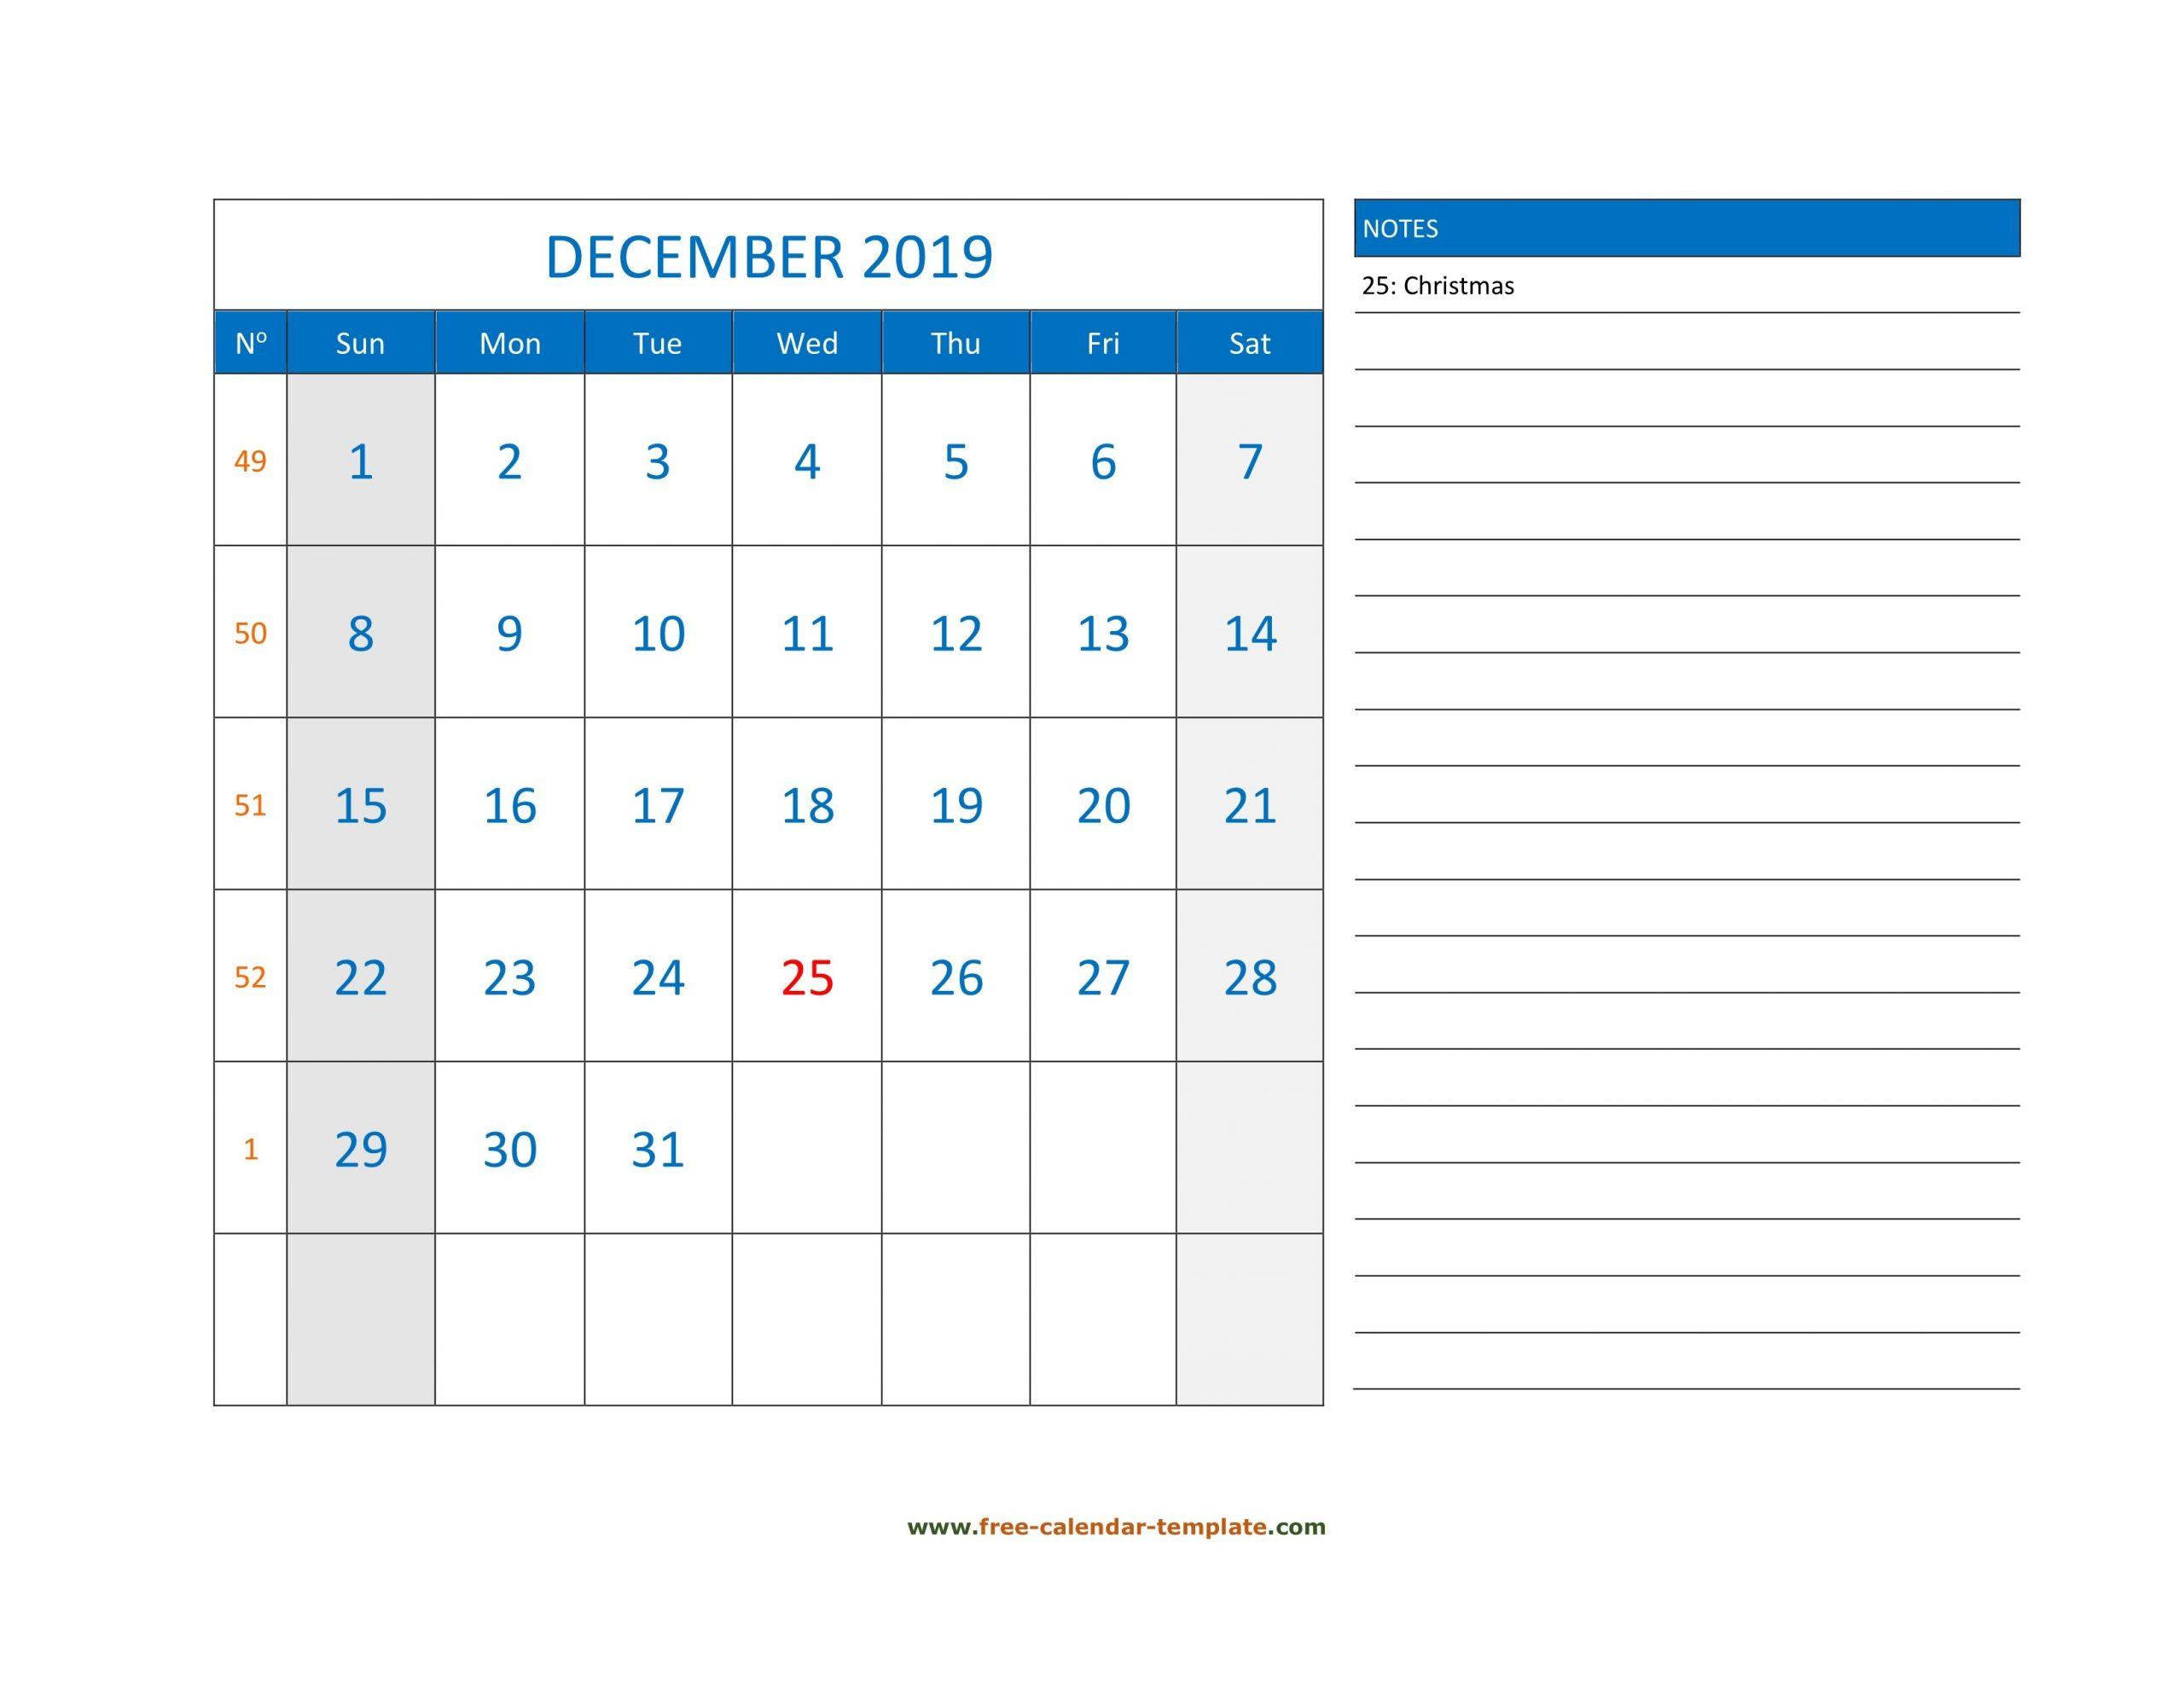 December Calendar 2019 Grid Lines For Holidays And Notes Free Weekly Numbered 52 Week Calendar Printable